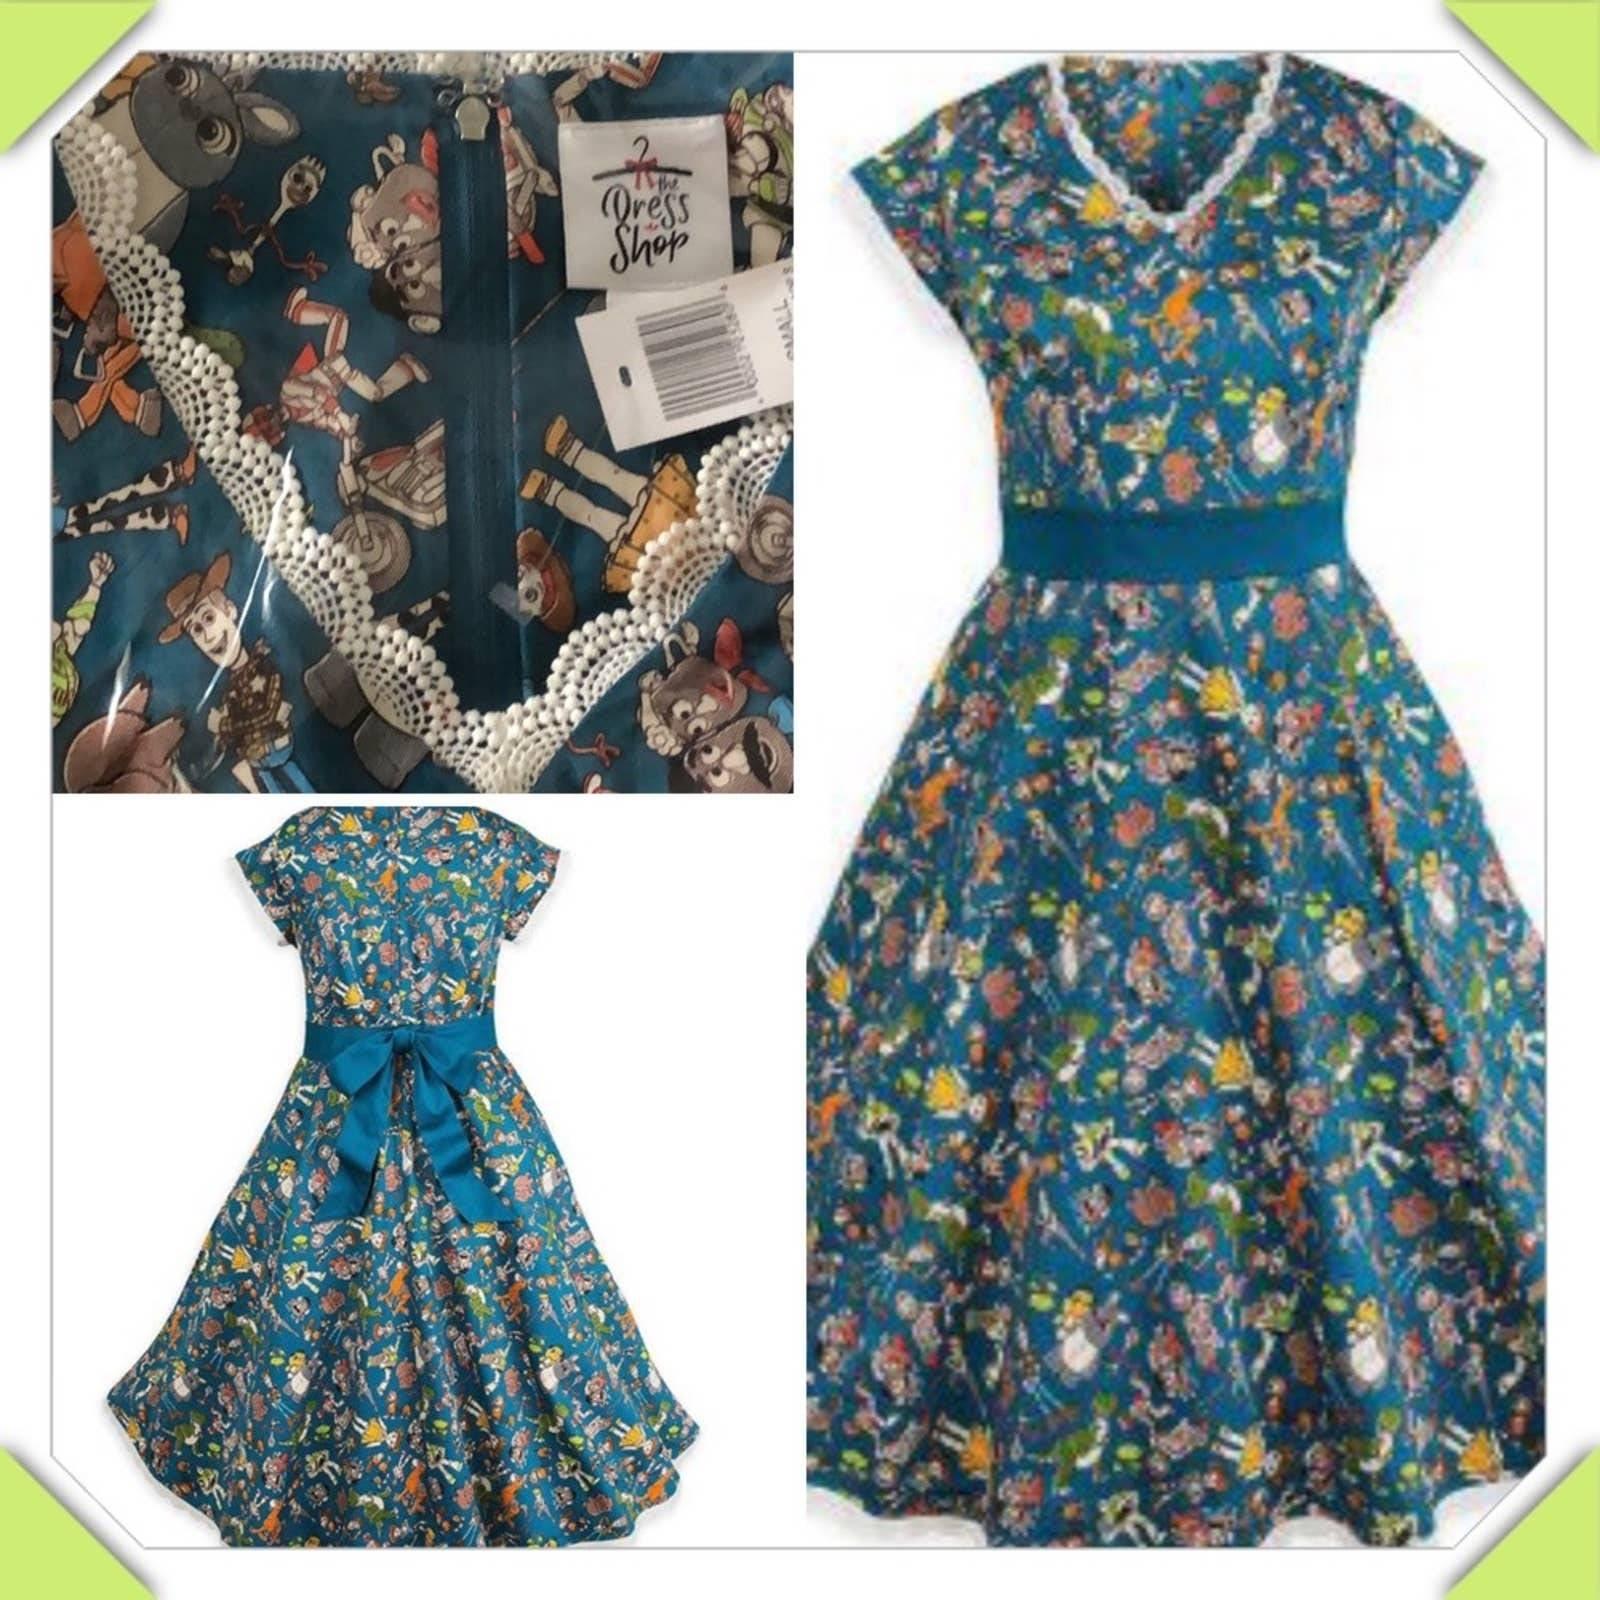 Disney The Dress Shop Toy Story 4 Dress